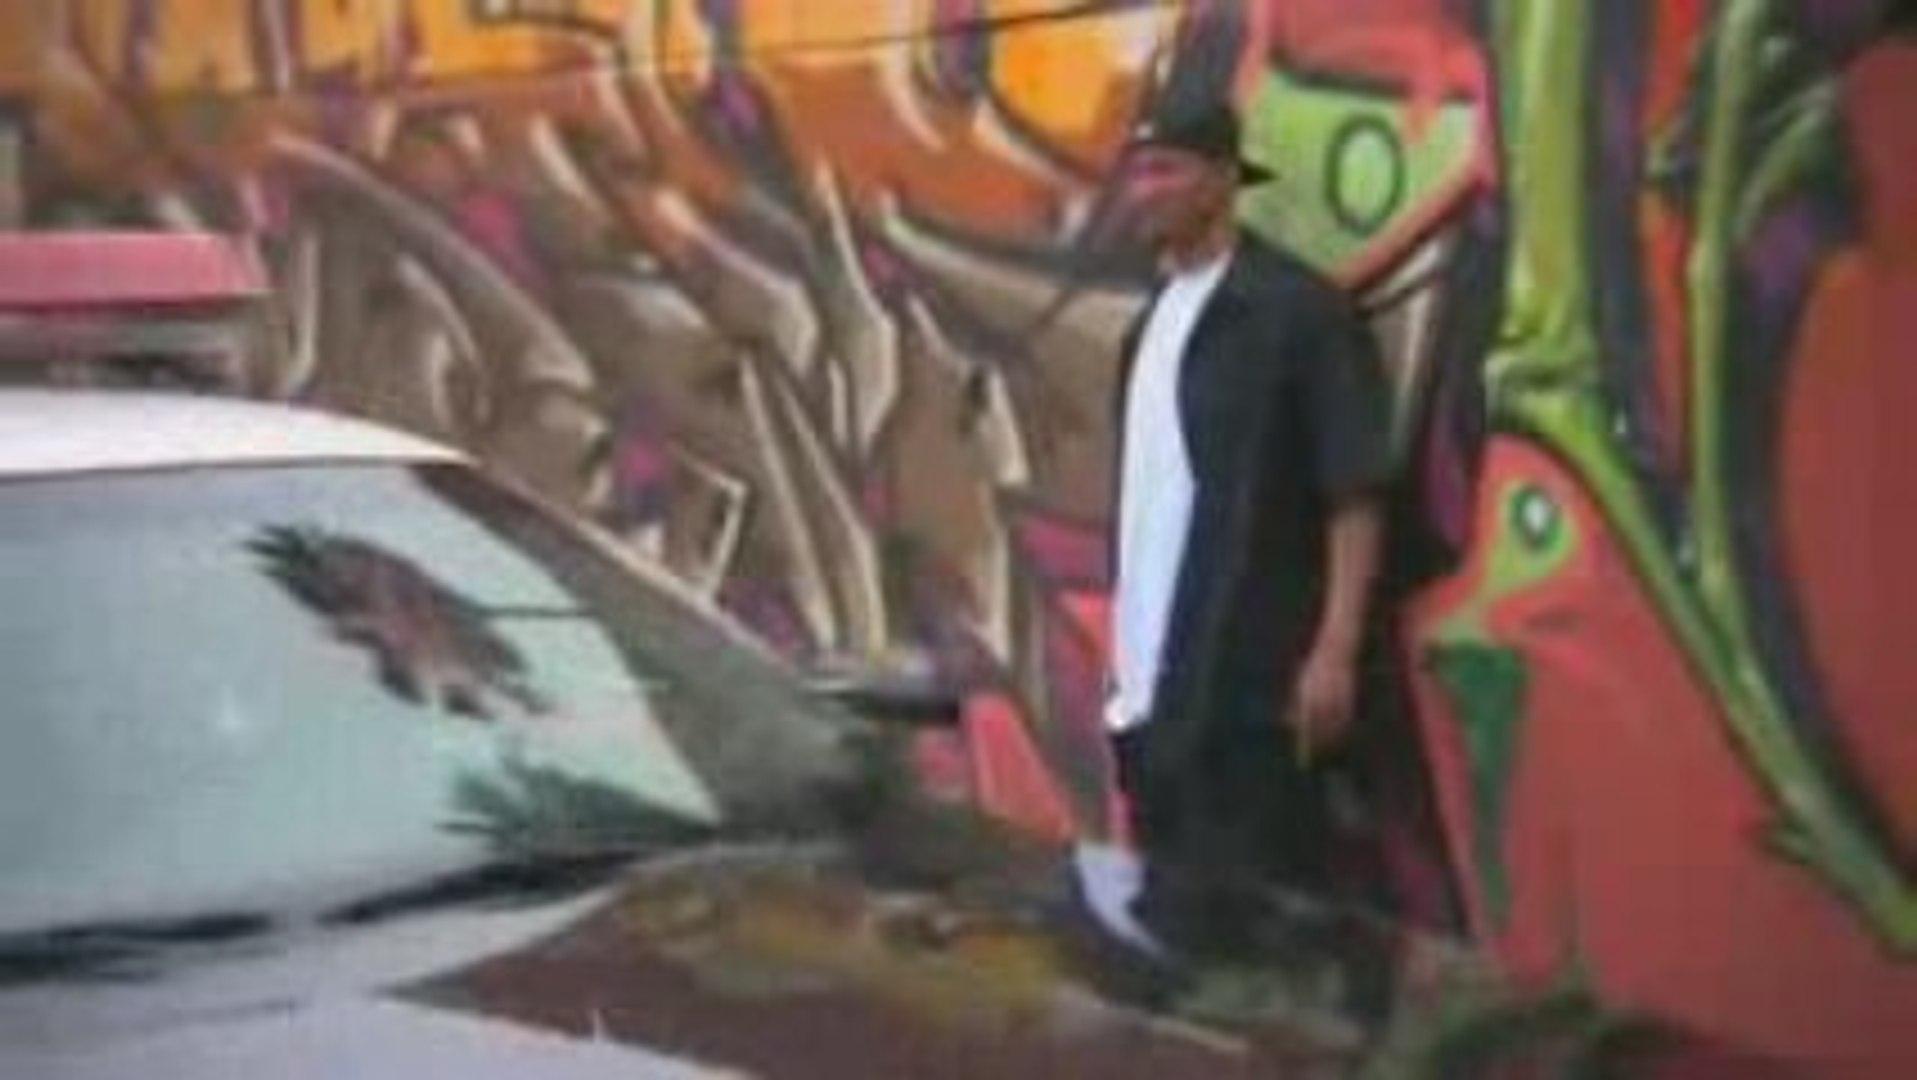 Blaq Poet Feat. MC Eiht & Young Malay - Ain't Nuttin' Change